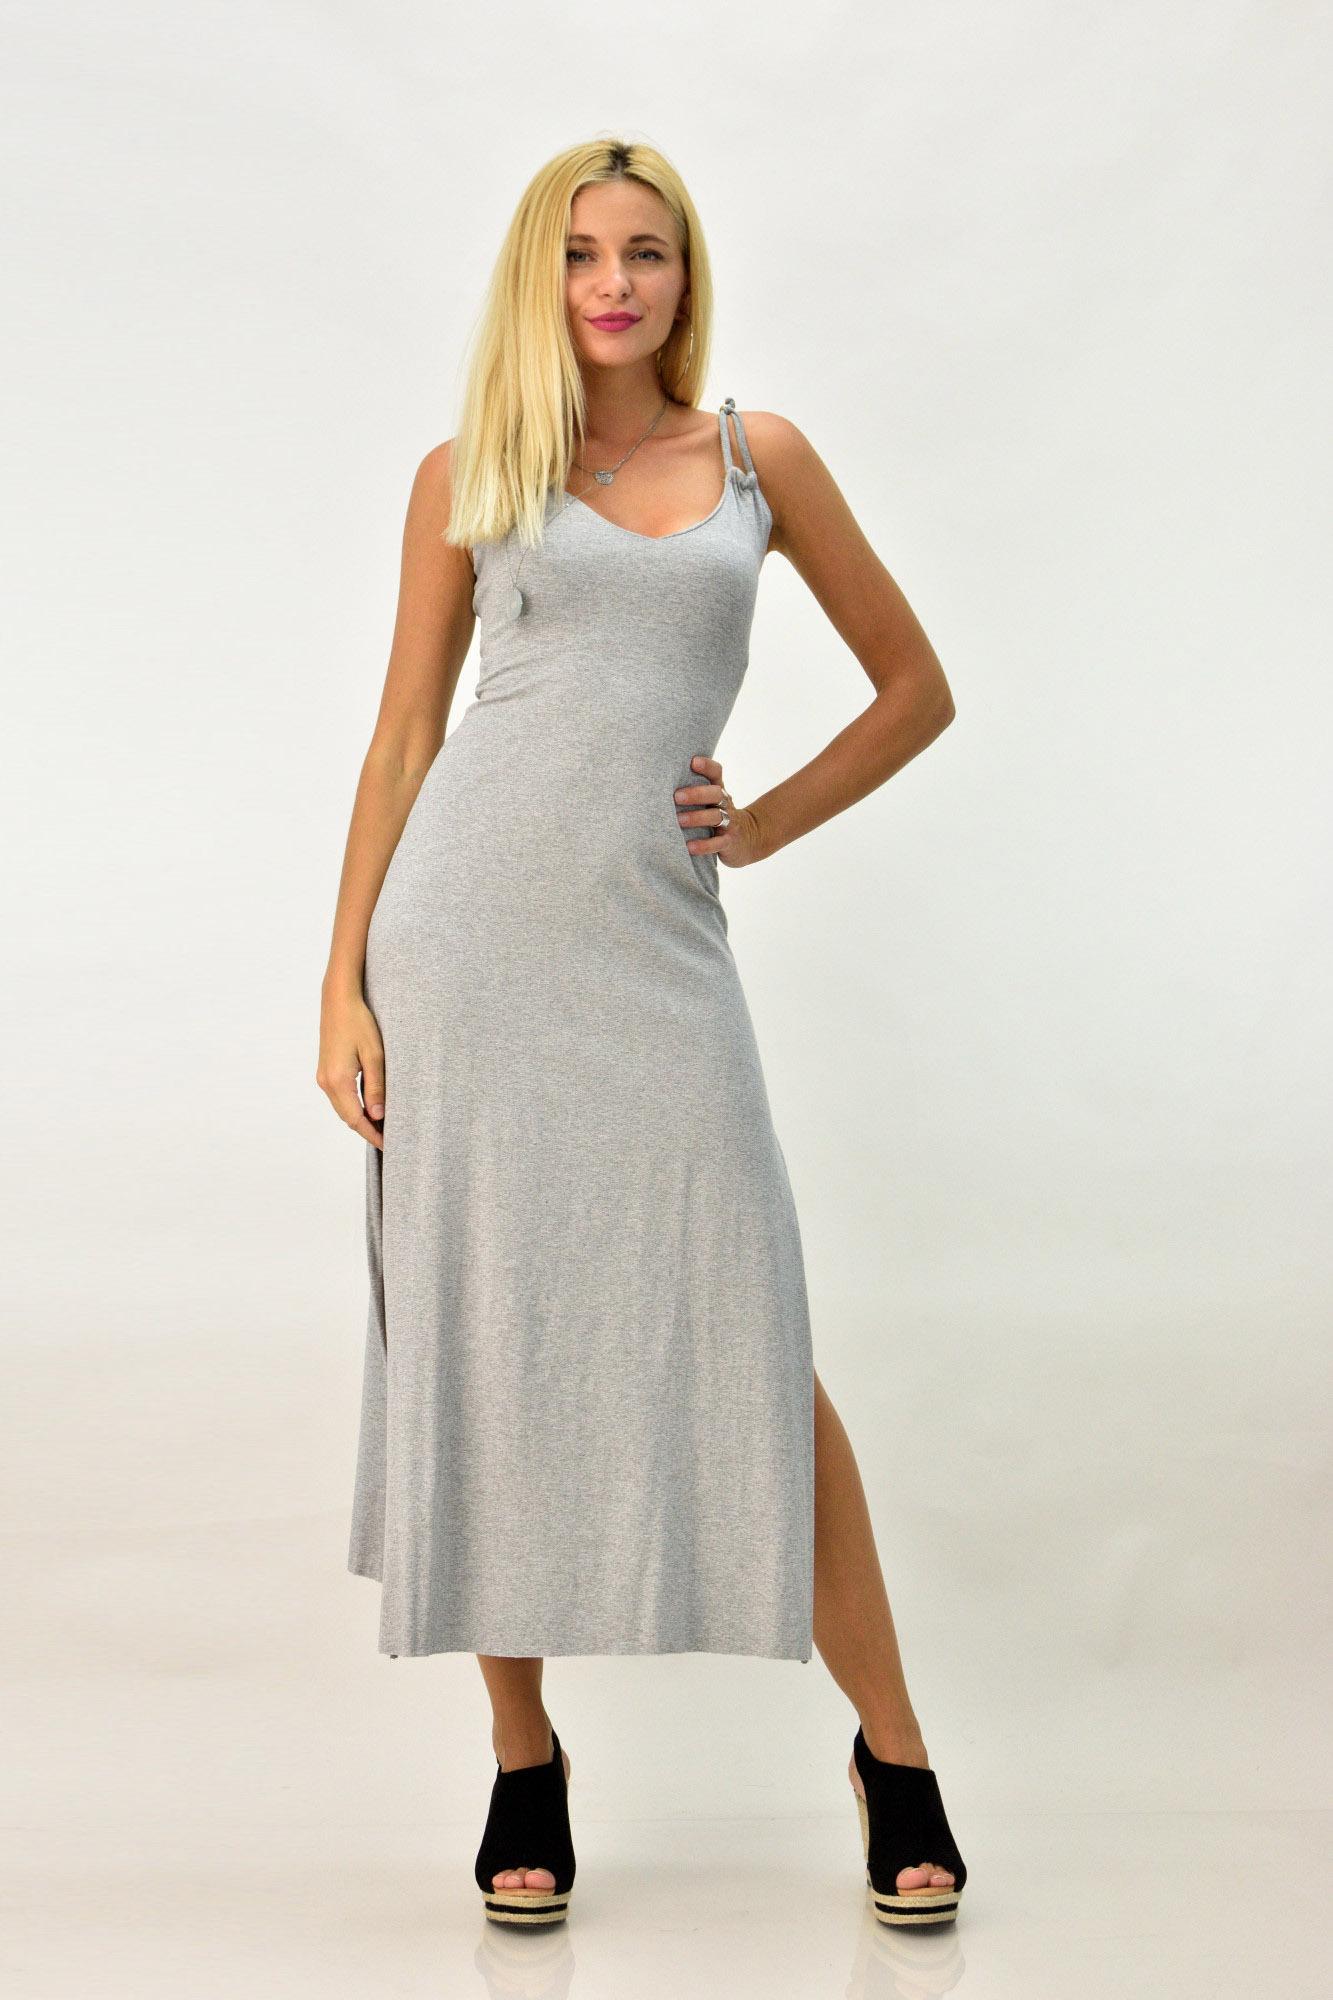 15bfb49c94c Εφαρμοστό μίντι φόρεμα με χιαστί στη πλάτη   POTRE